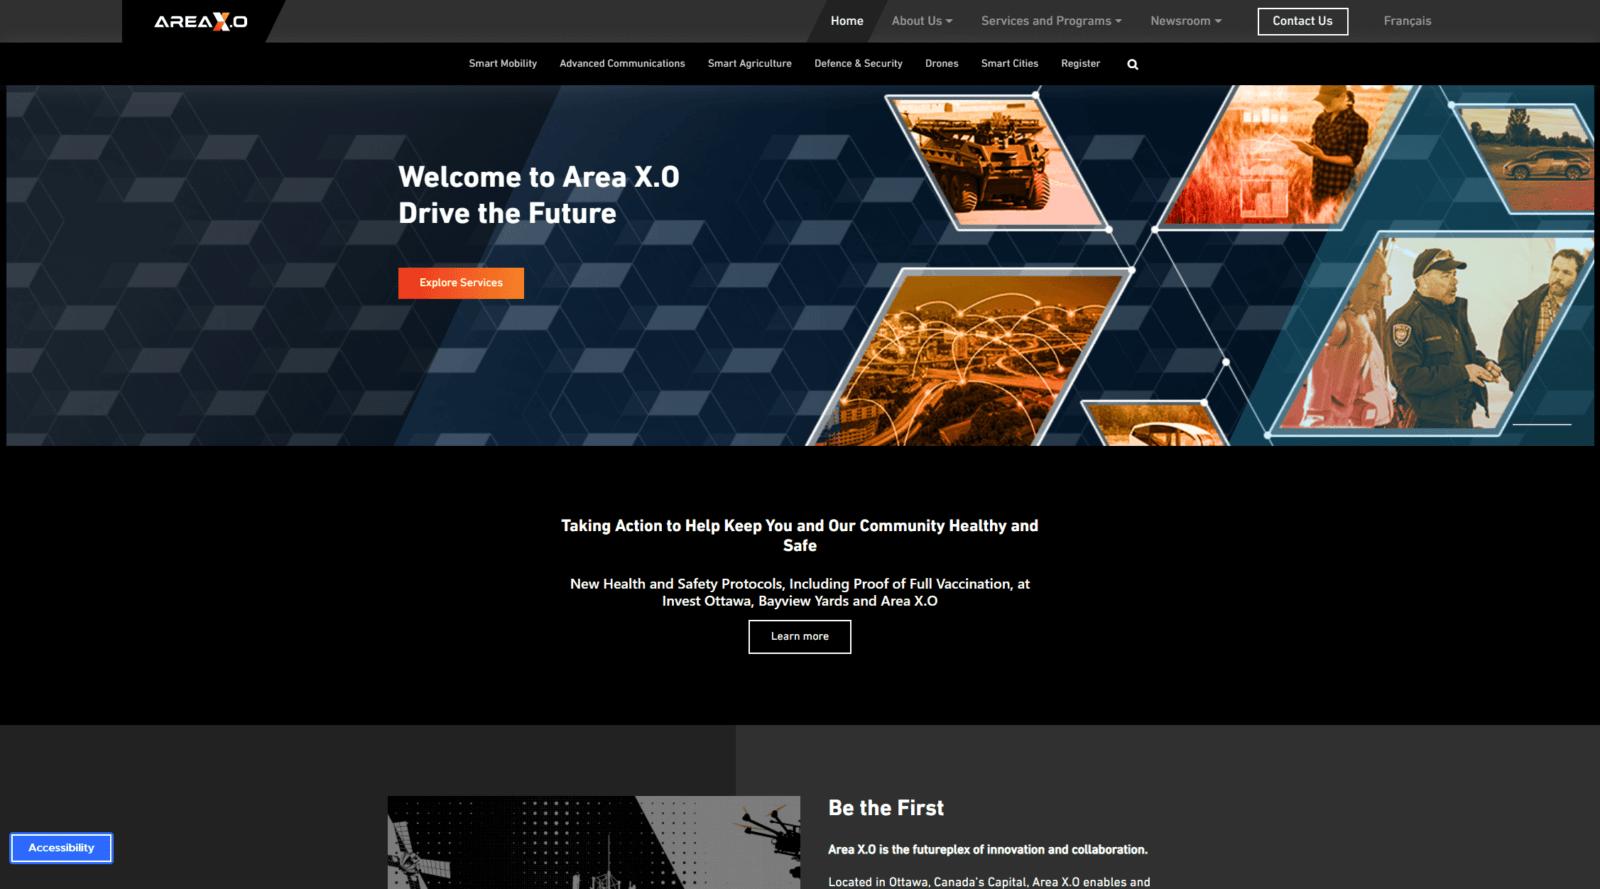 areaxo.com